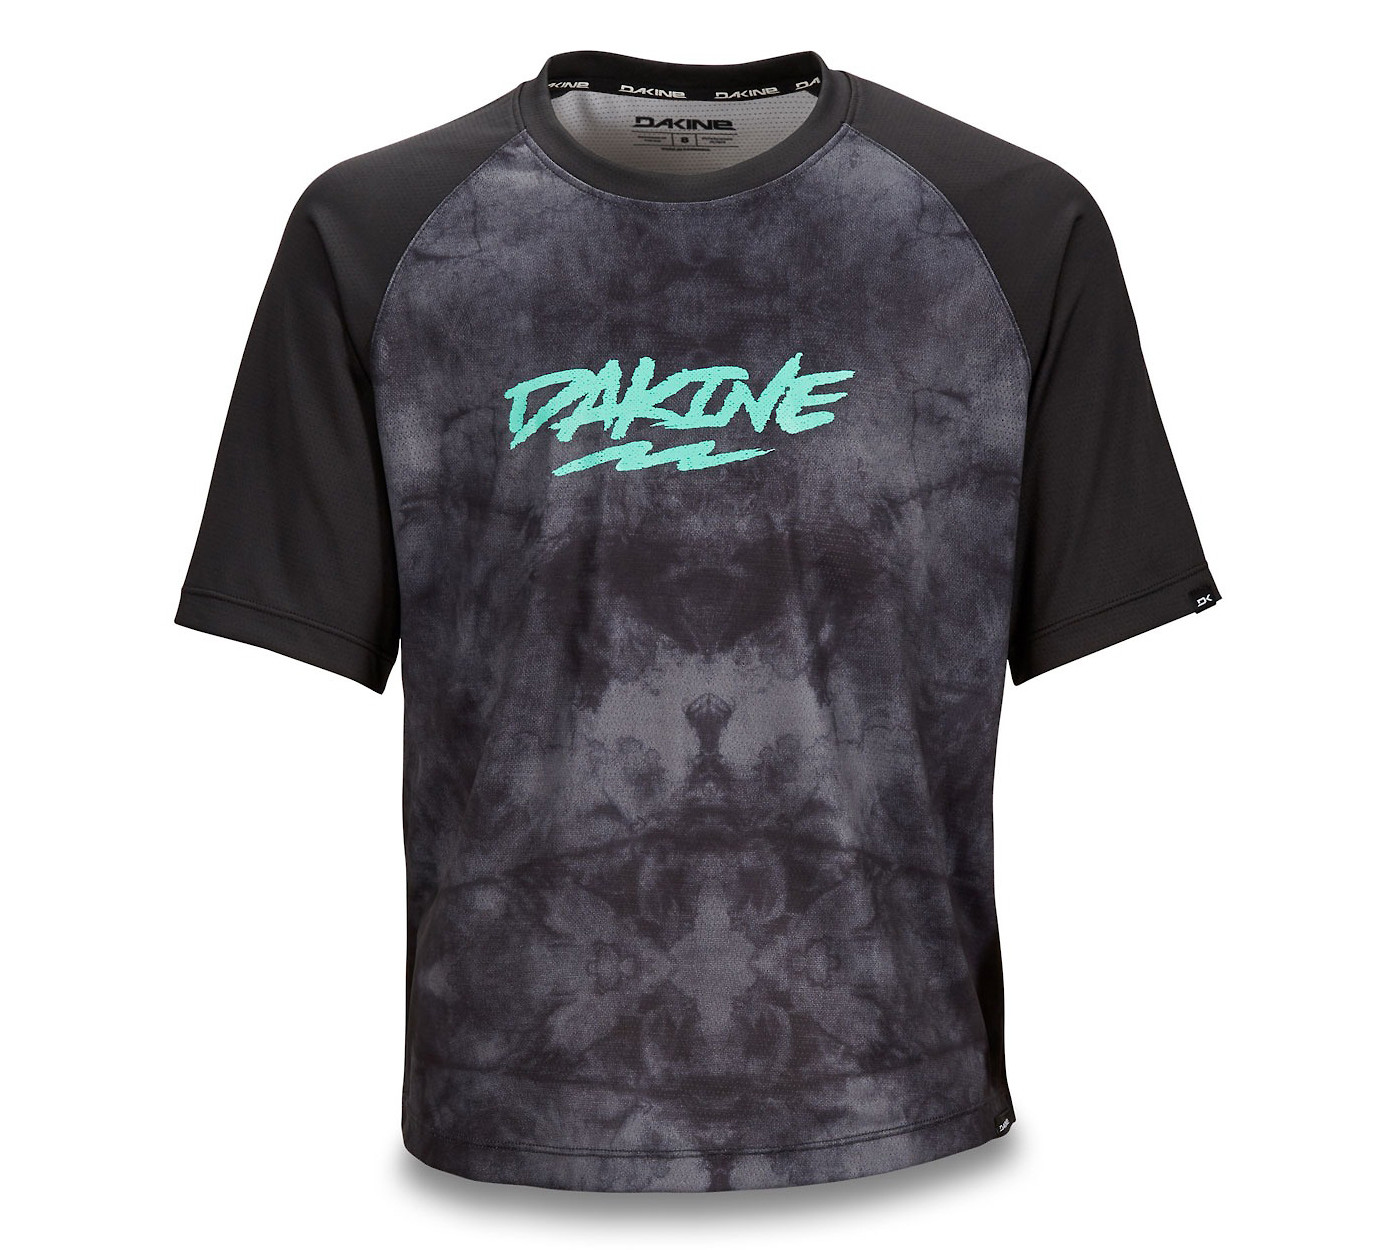 Dakine Prodigy S/S - Black Haze